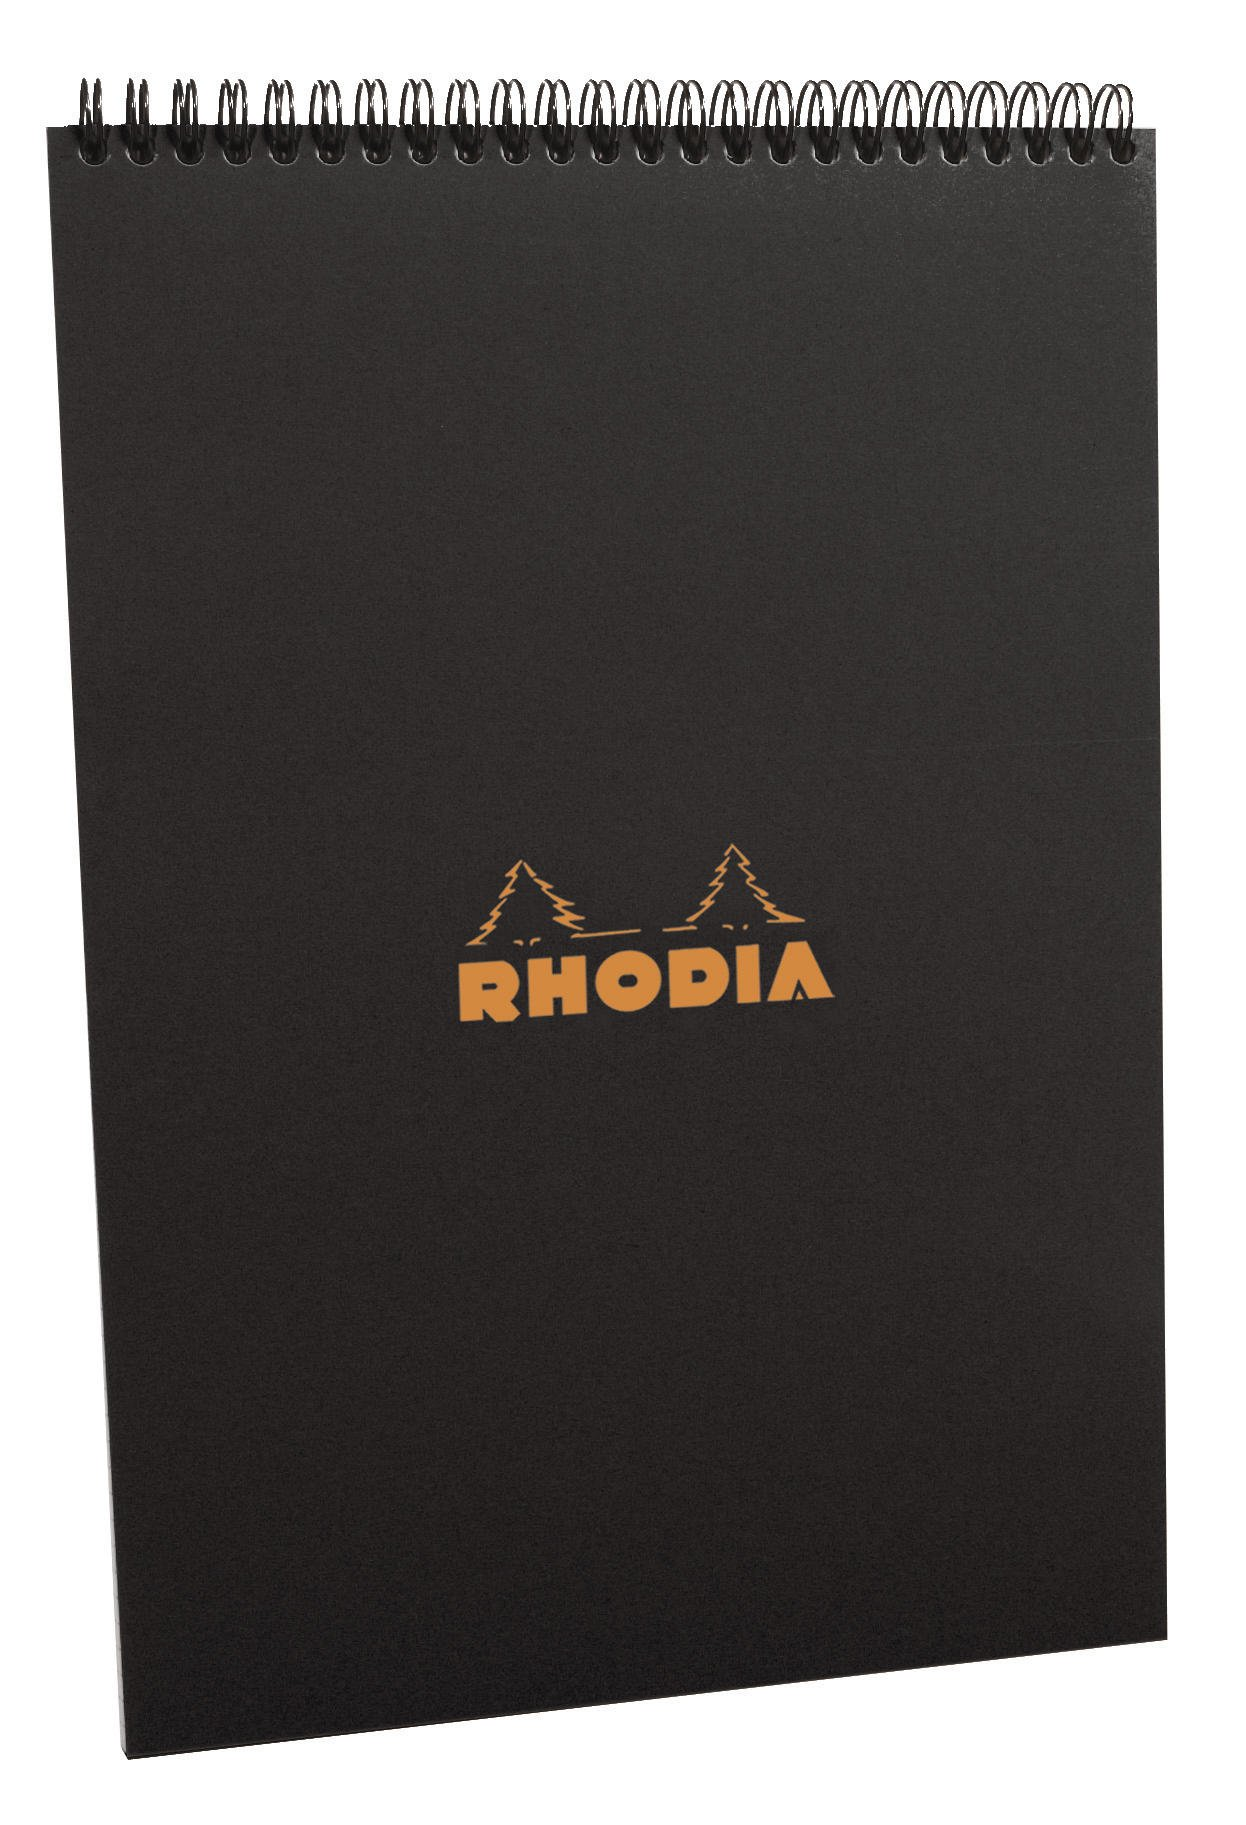 Rhodia Notepads Graph Black Wb 8.3 x 11.7